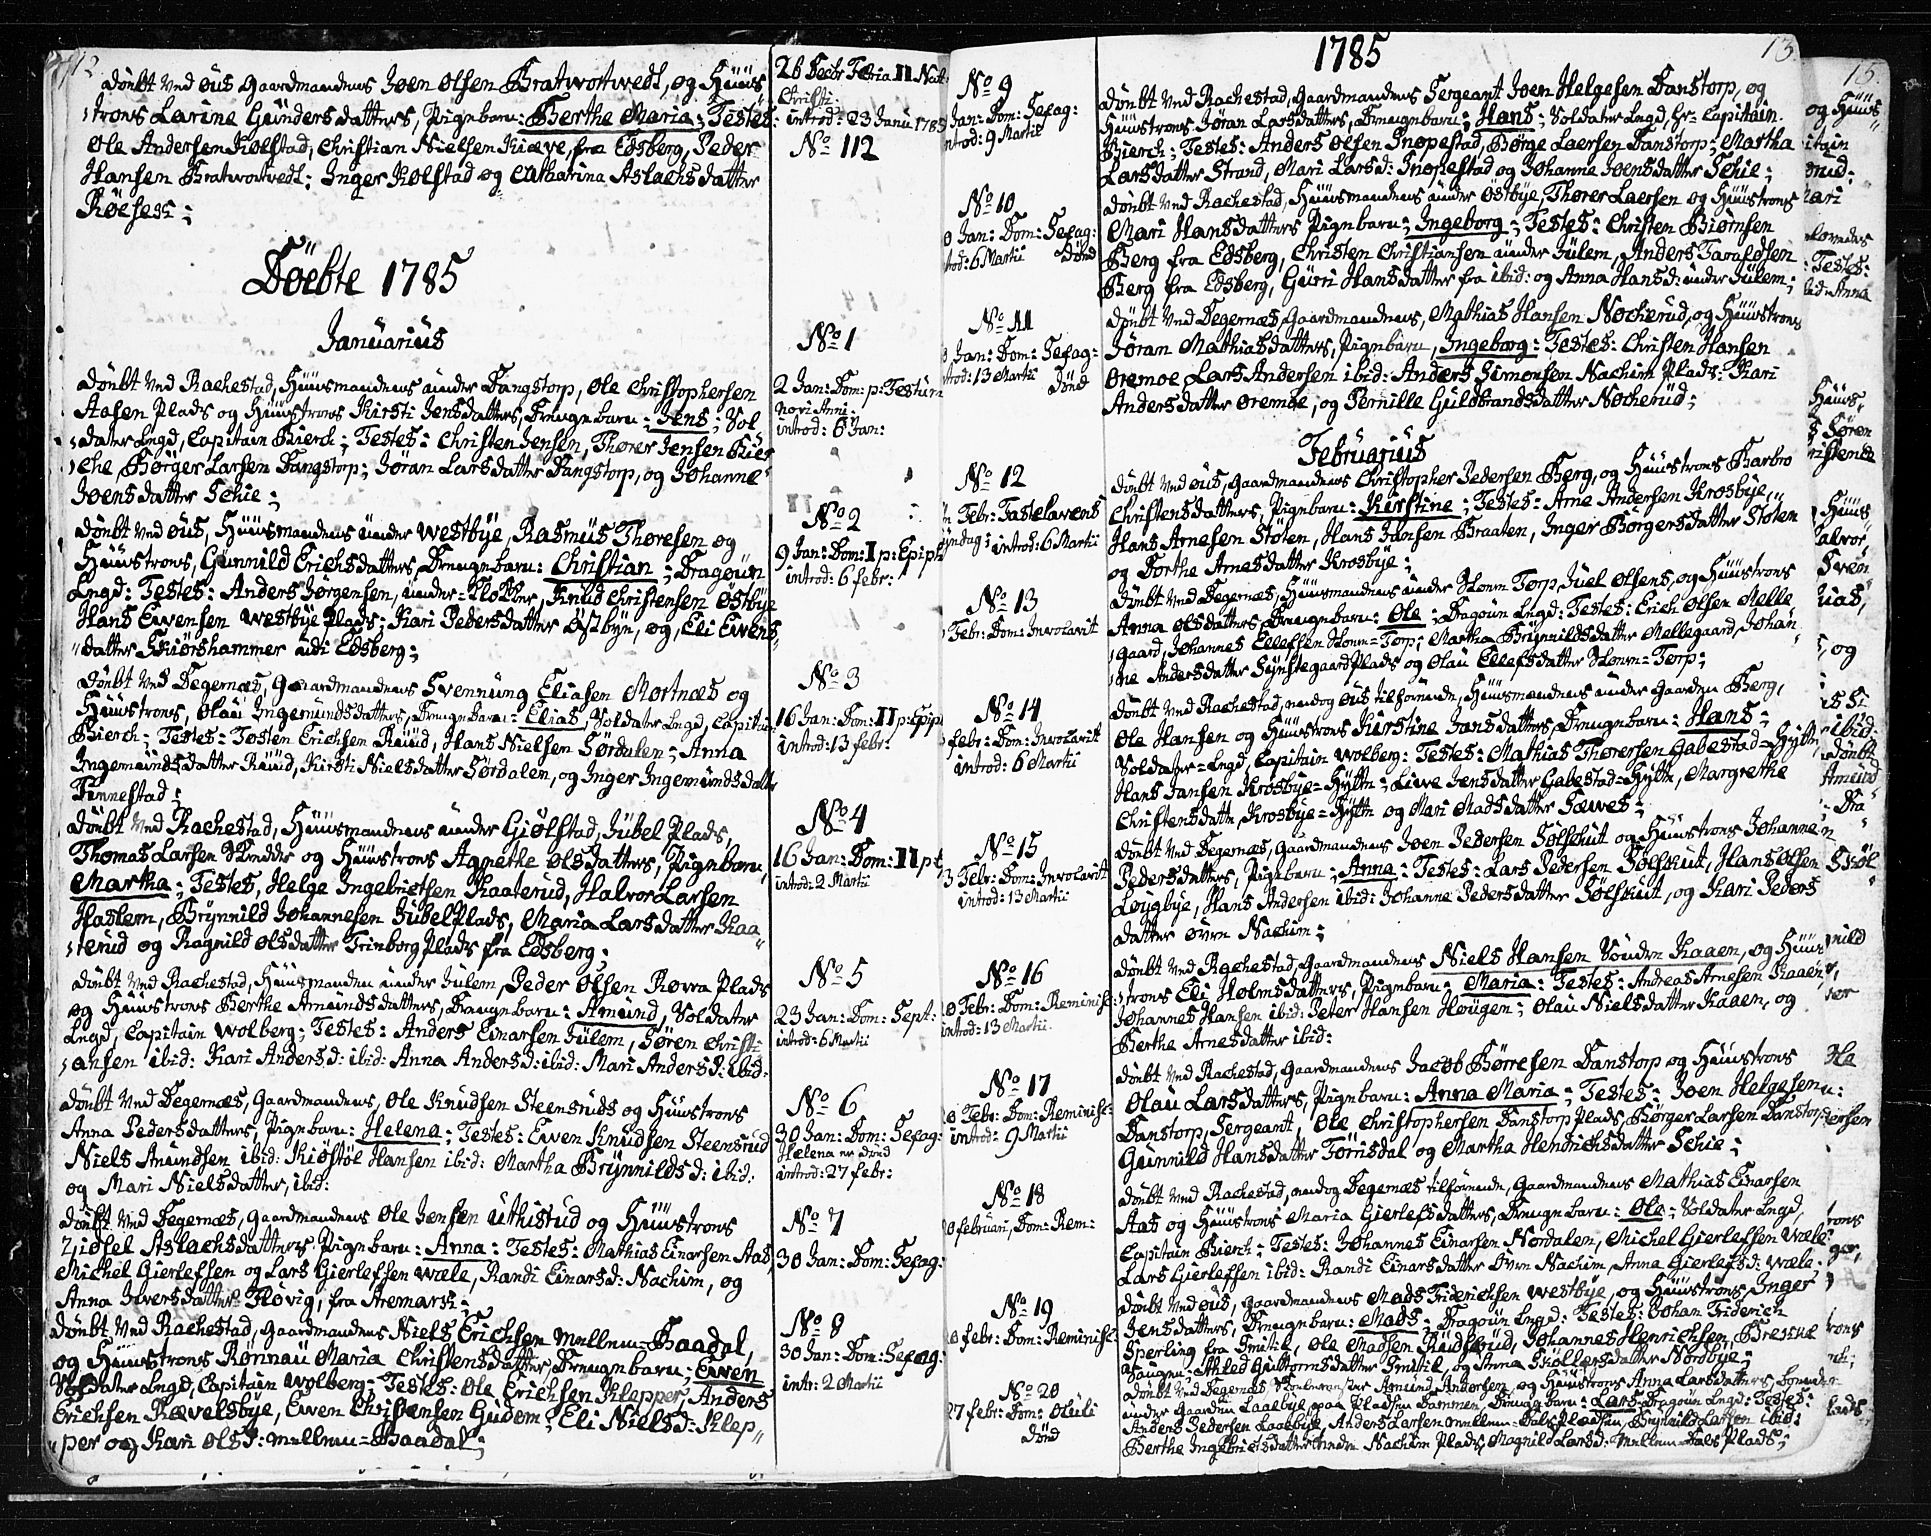 SAO, Rakkestad prestekontor Kirkebøker, F/Fa/L0005: Ministerialbok nr. I 5, 1784-1814, s. 12-13